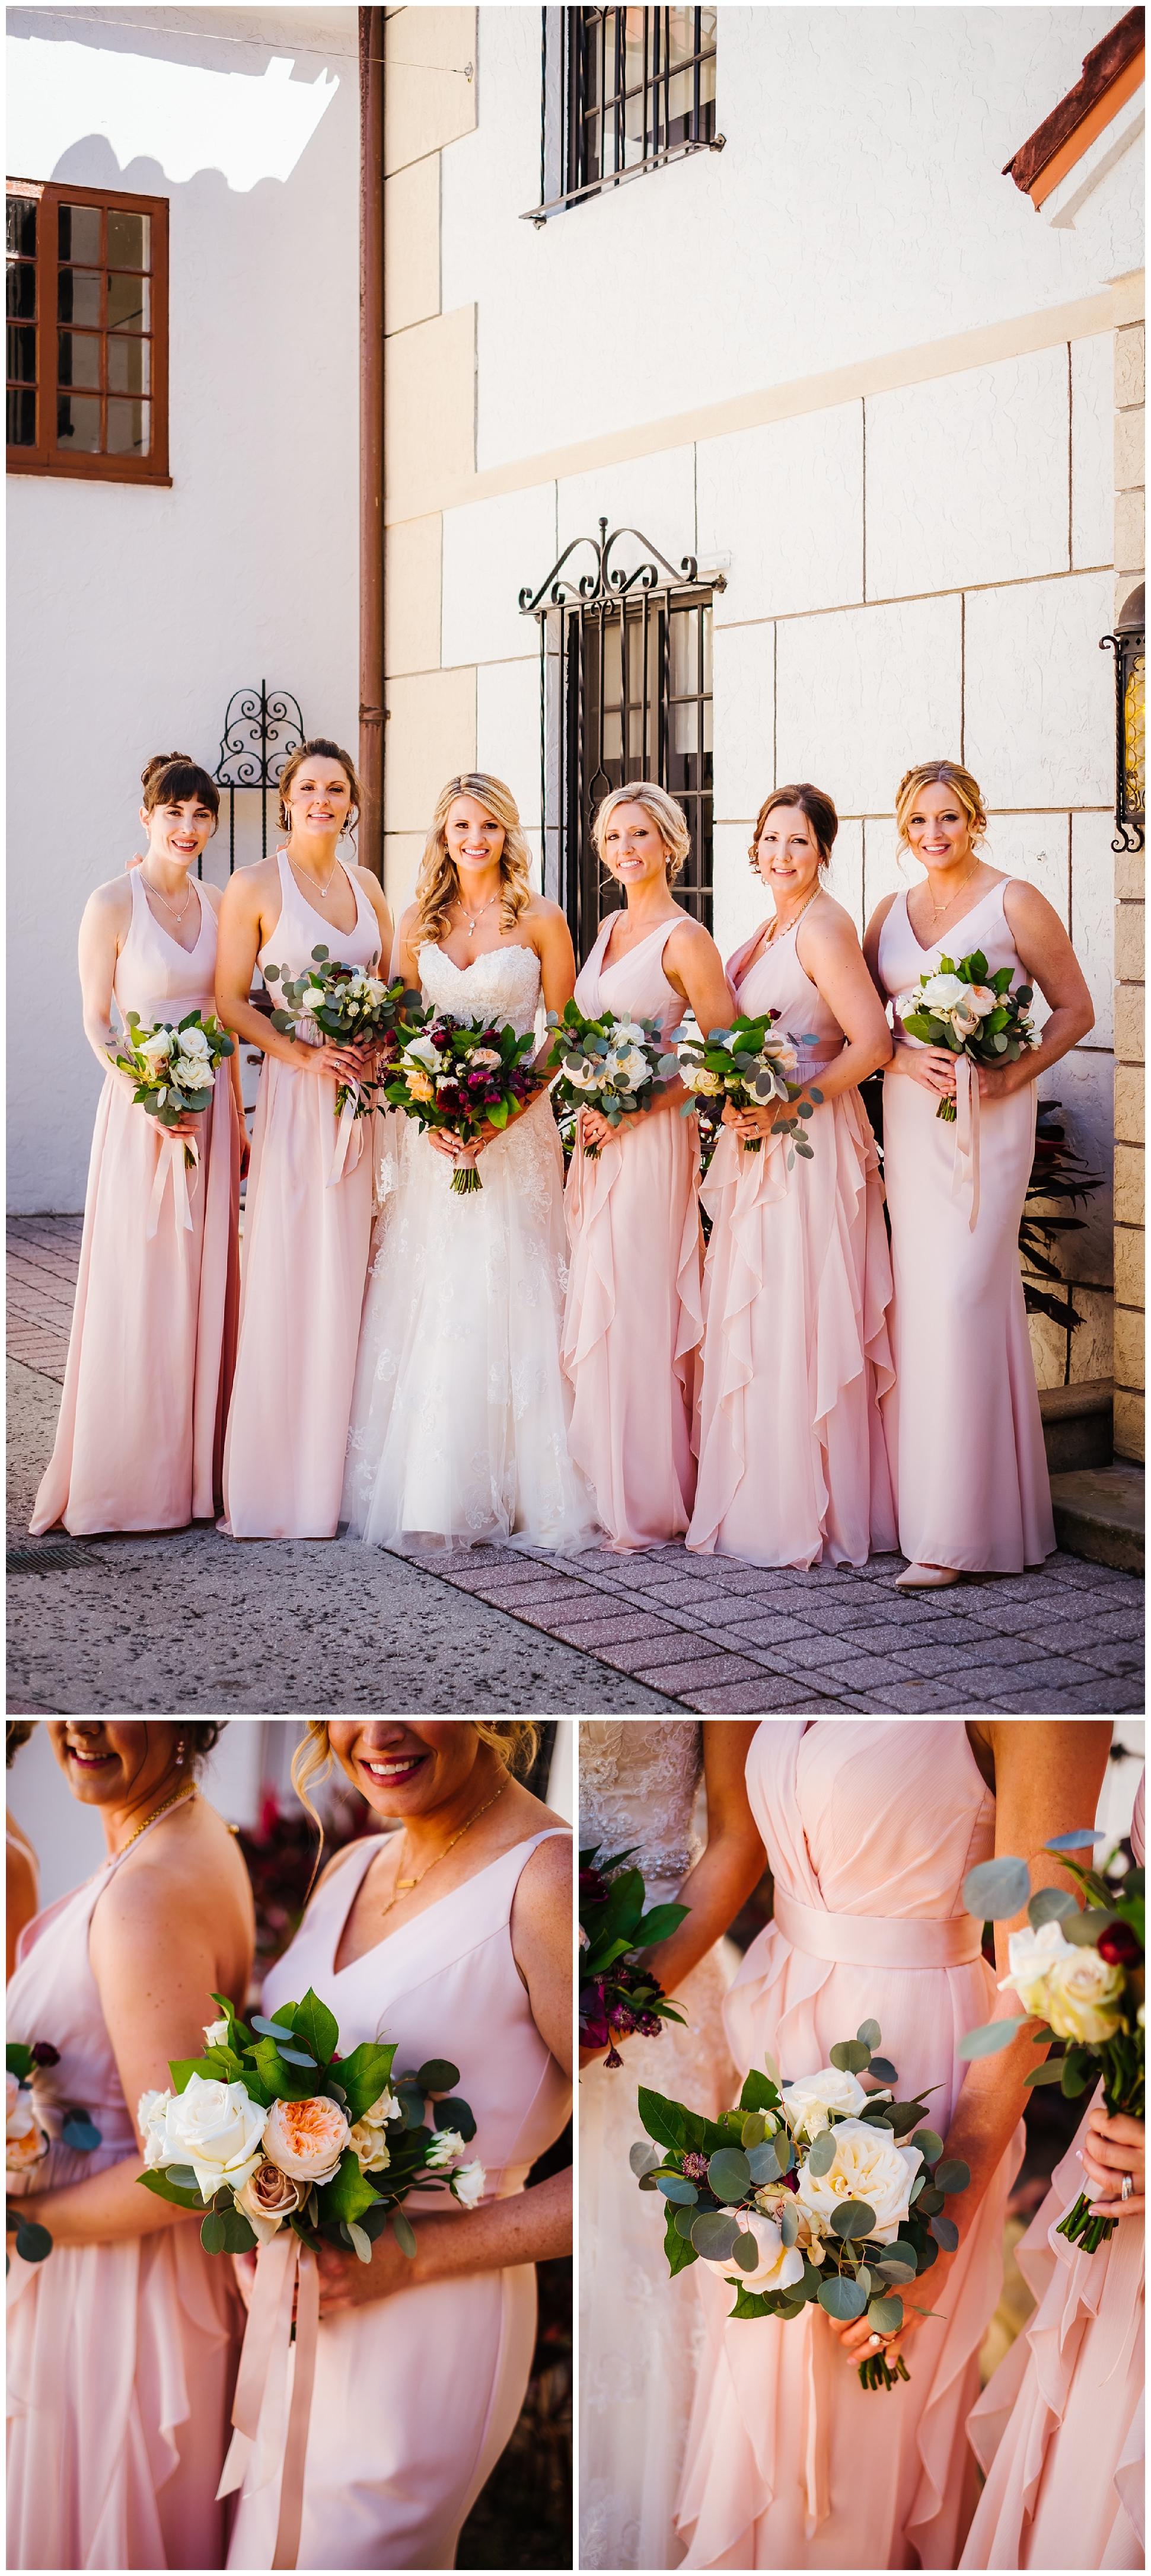 tampa-bradenton-wedding-photographer-south-florida-museum-classic-blush-gold-alpacas-sparklers_0030.jpg